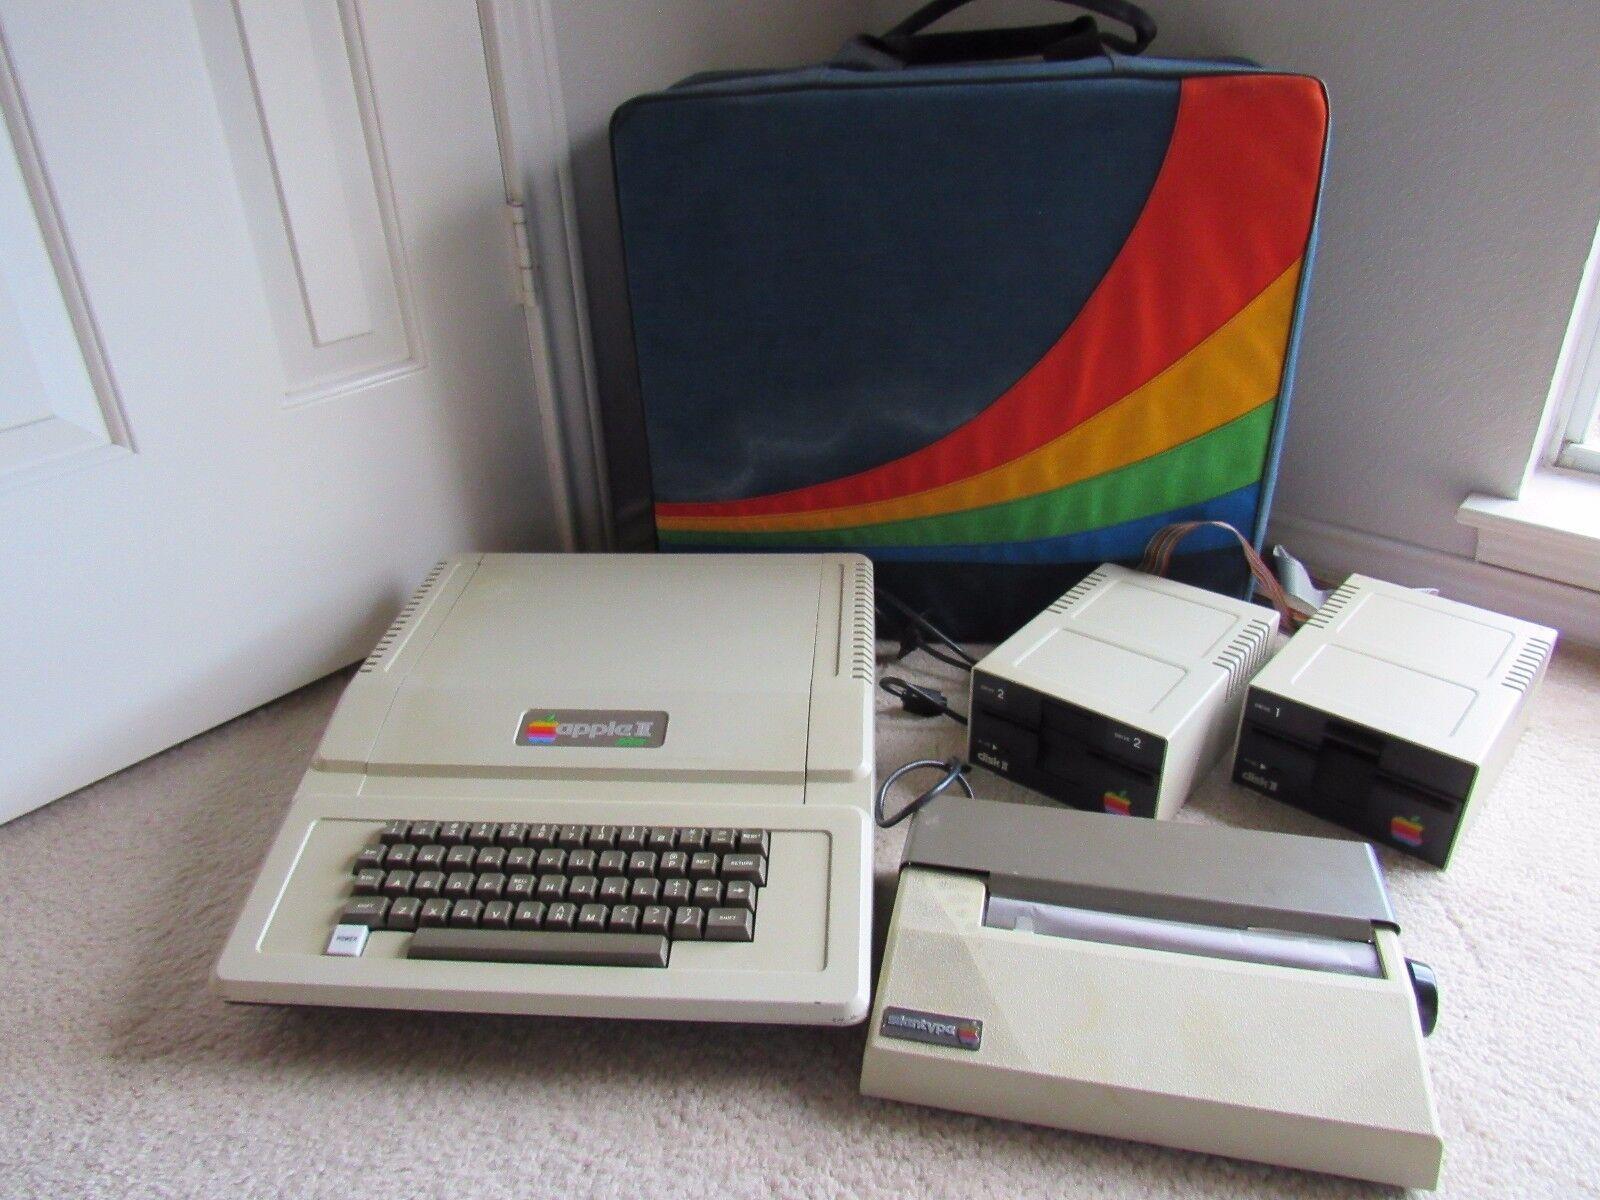 Vintage Apple Computer w/ Rainbow Storage Travel Bag, 2 Disk Drives, Printer Lot